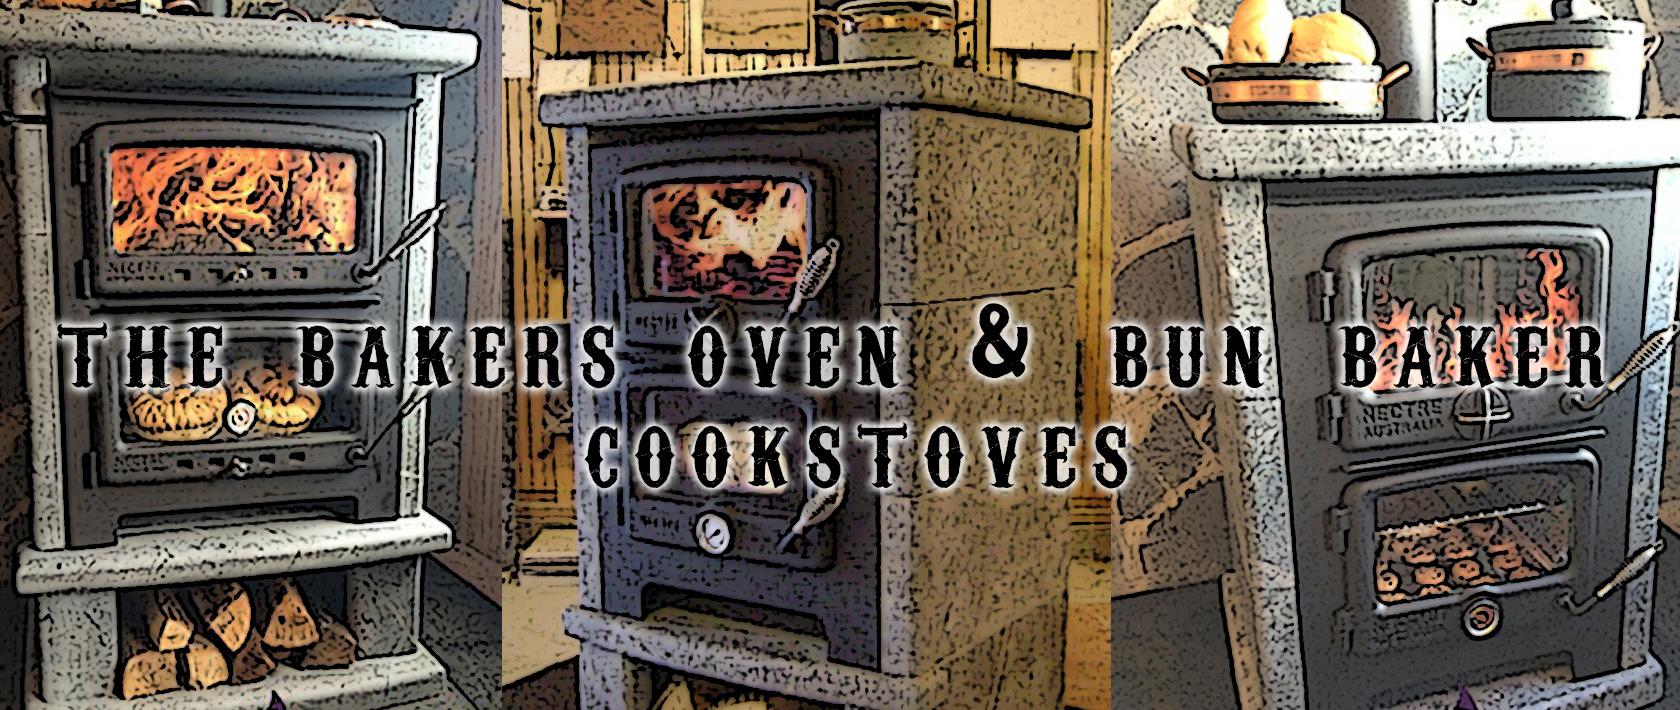 Bun Baker Cookstove – Cookstove Community